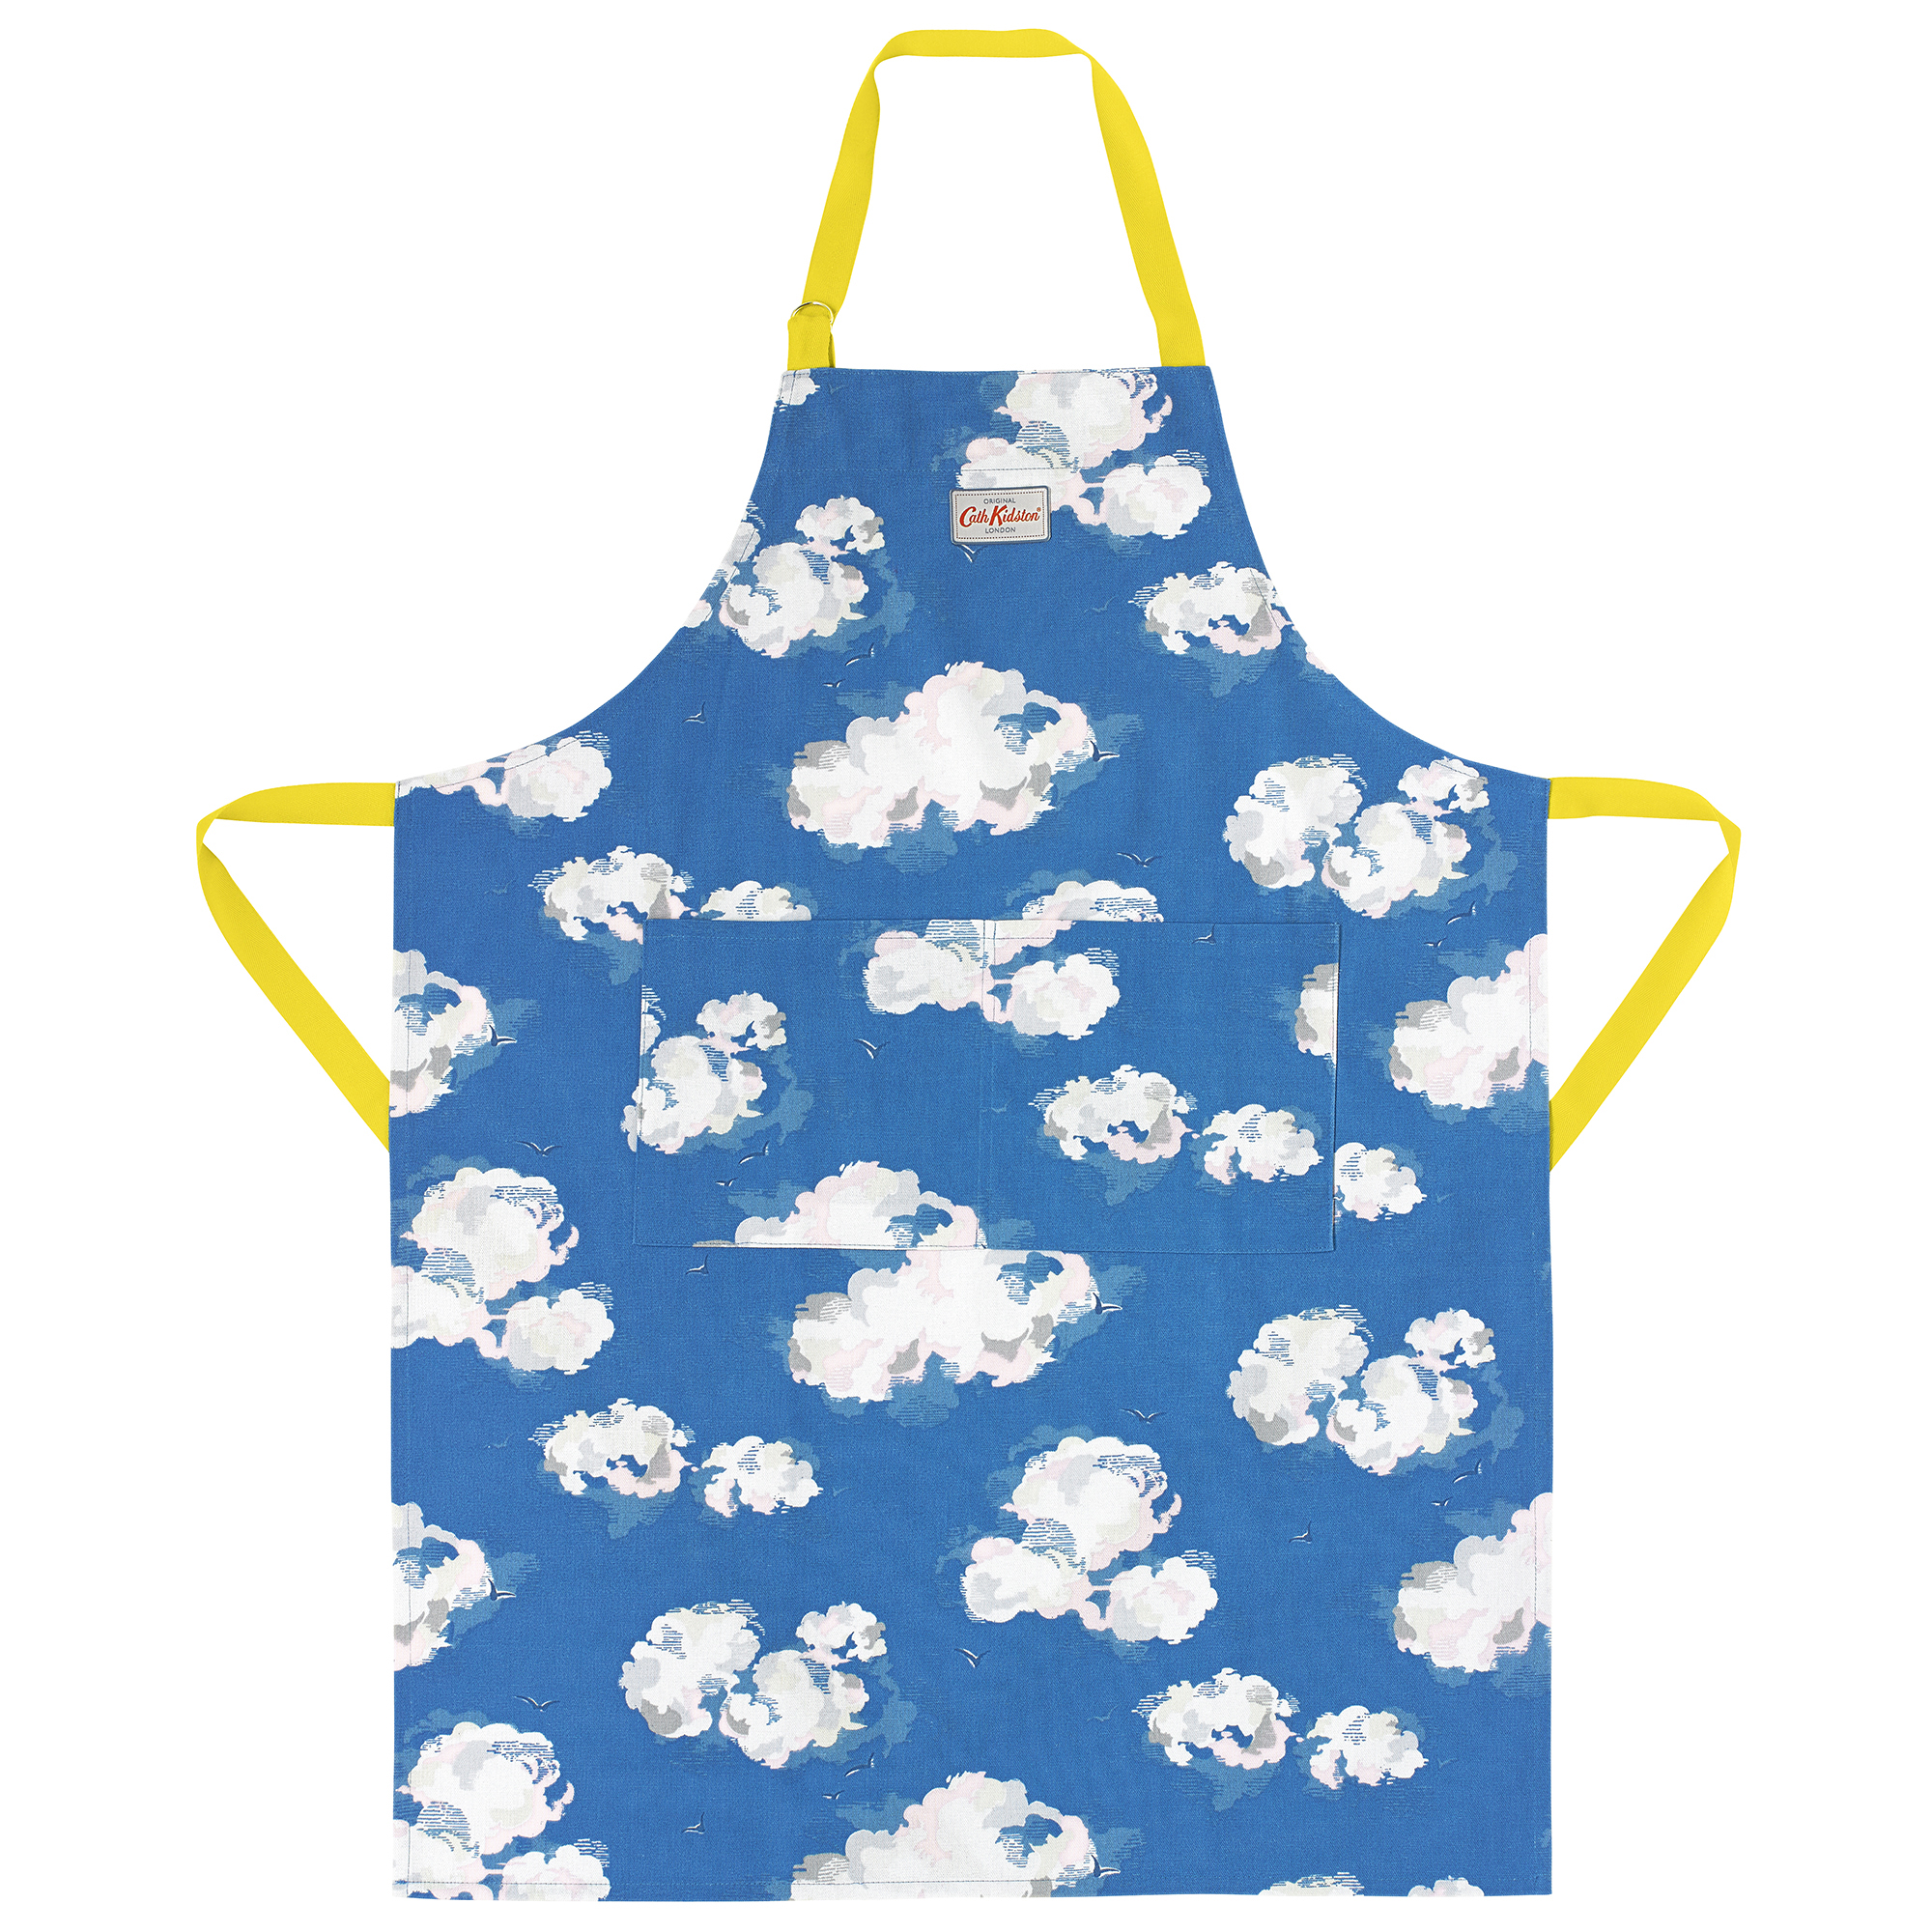 Cath Kidston Clouds Apron